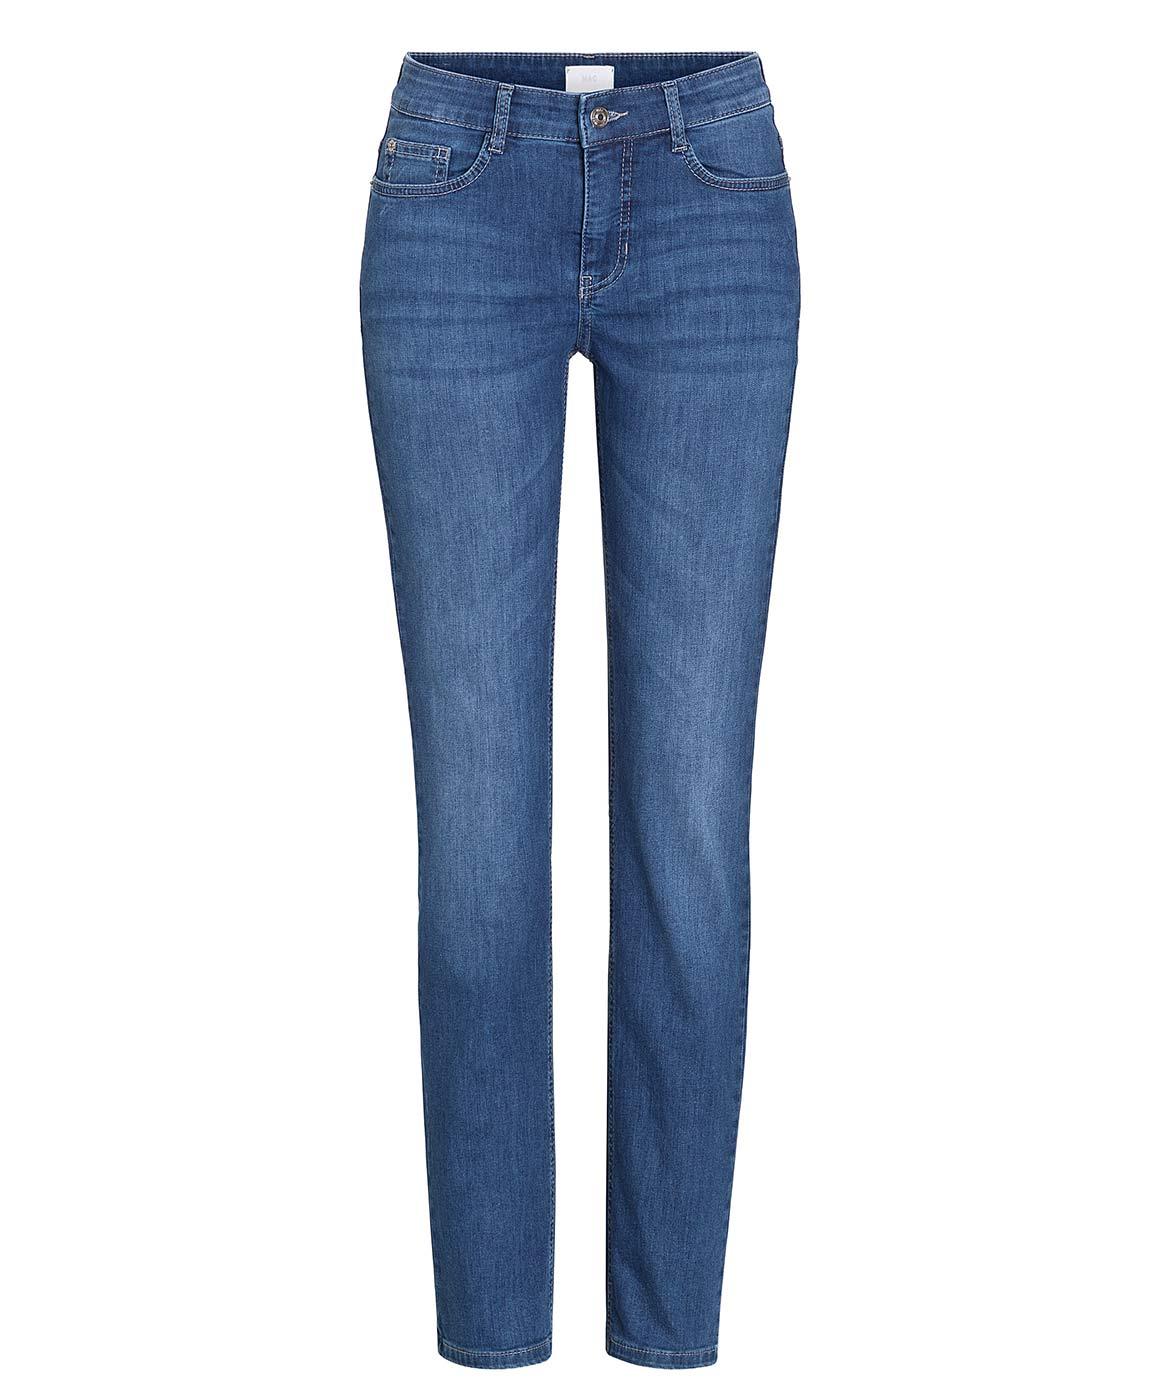 ANGELA Jeans - Slim Fit - Mid Authentic